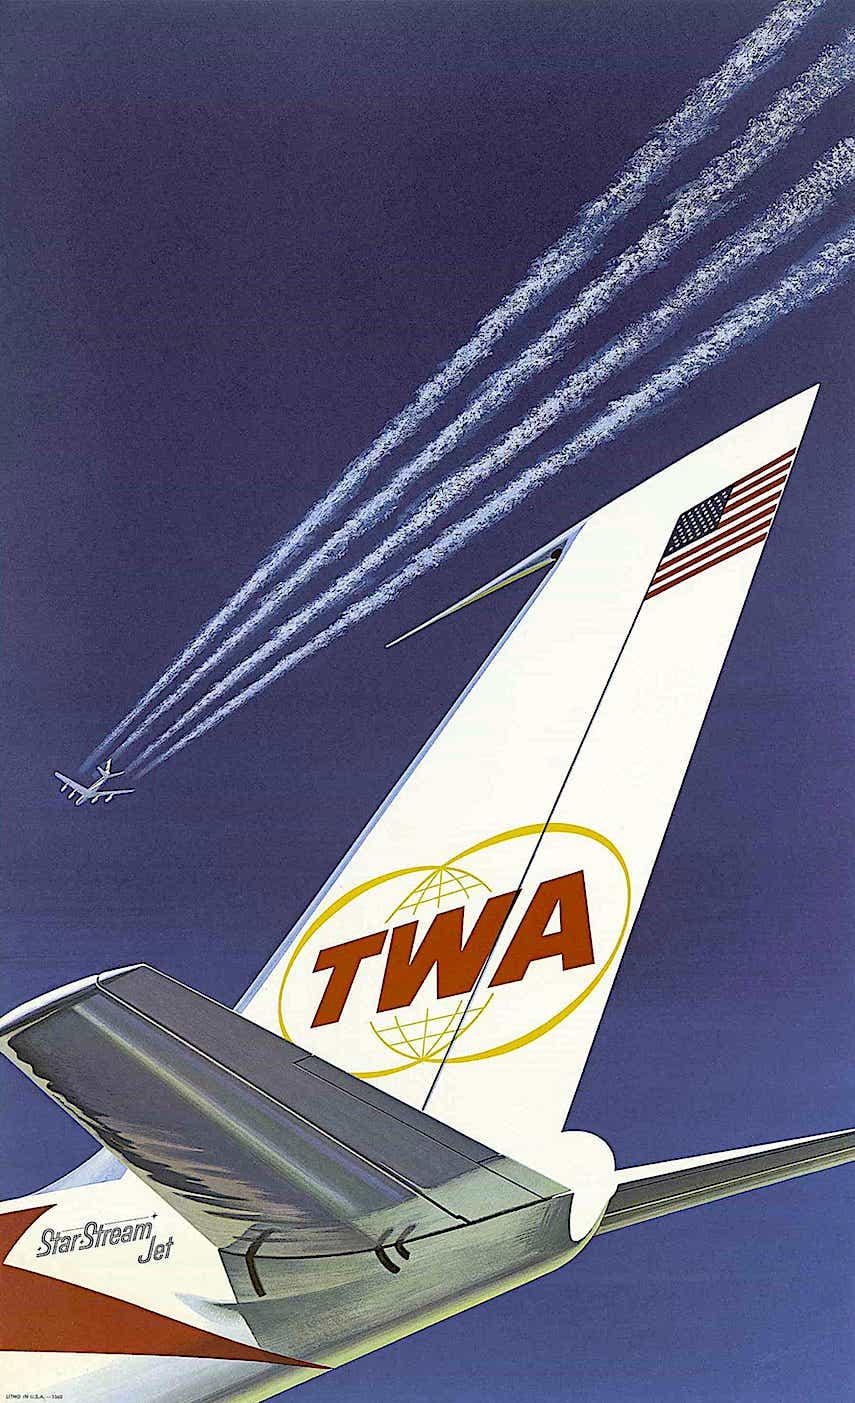 poster art of a TWA Star Stream passenger jet, 1960